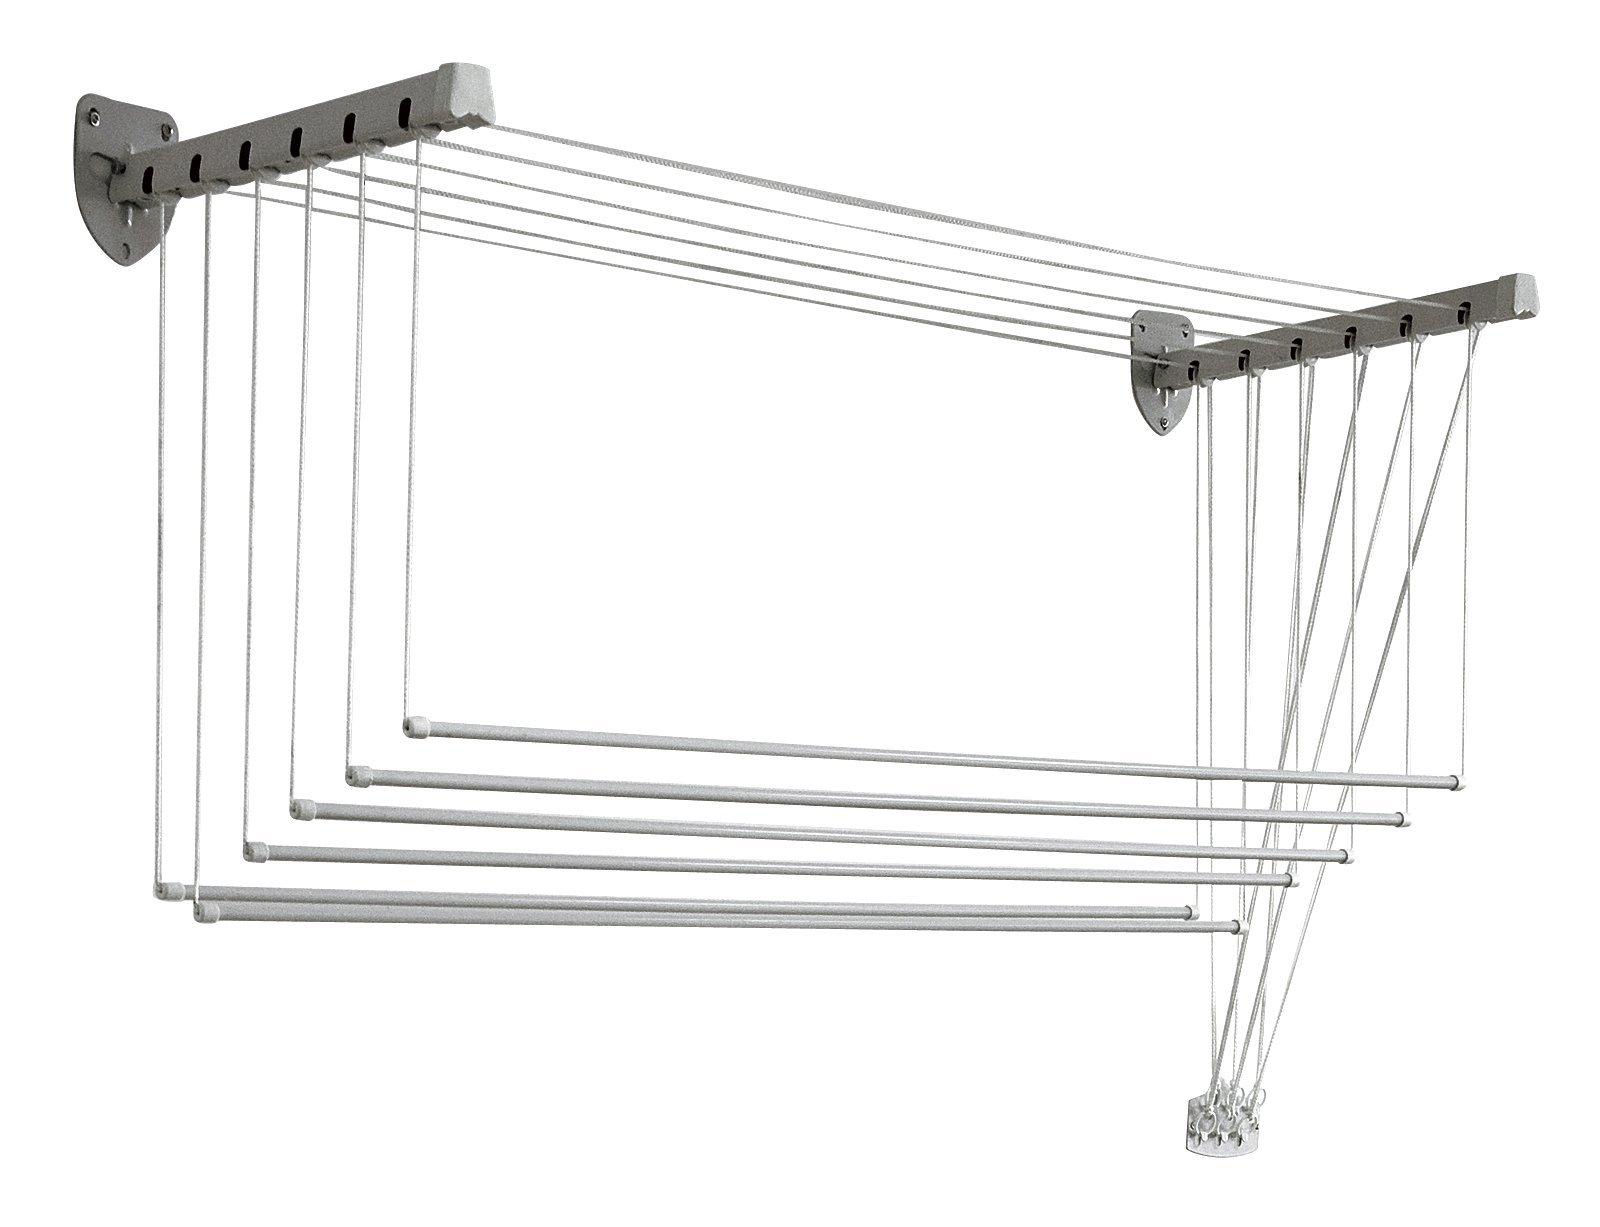 TENDEDERO TECHO / PARED 160 cm MOD. MC-2 product image